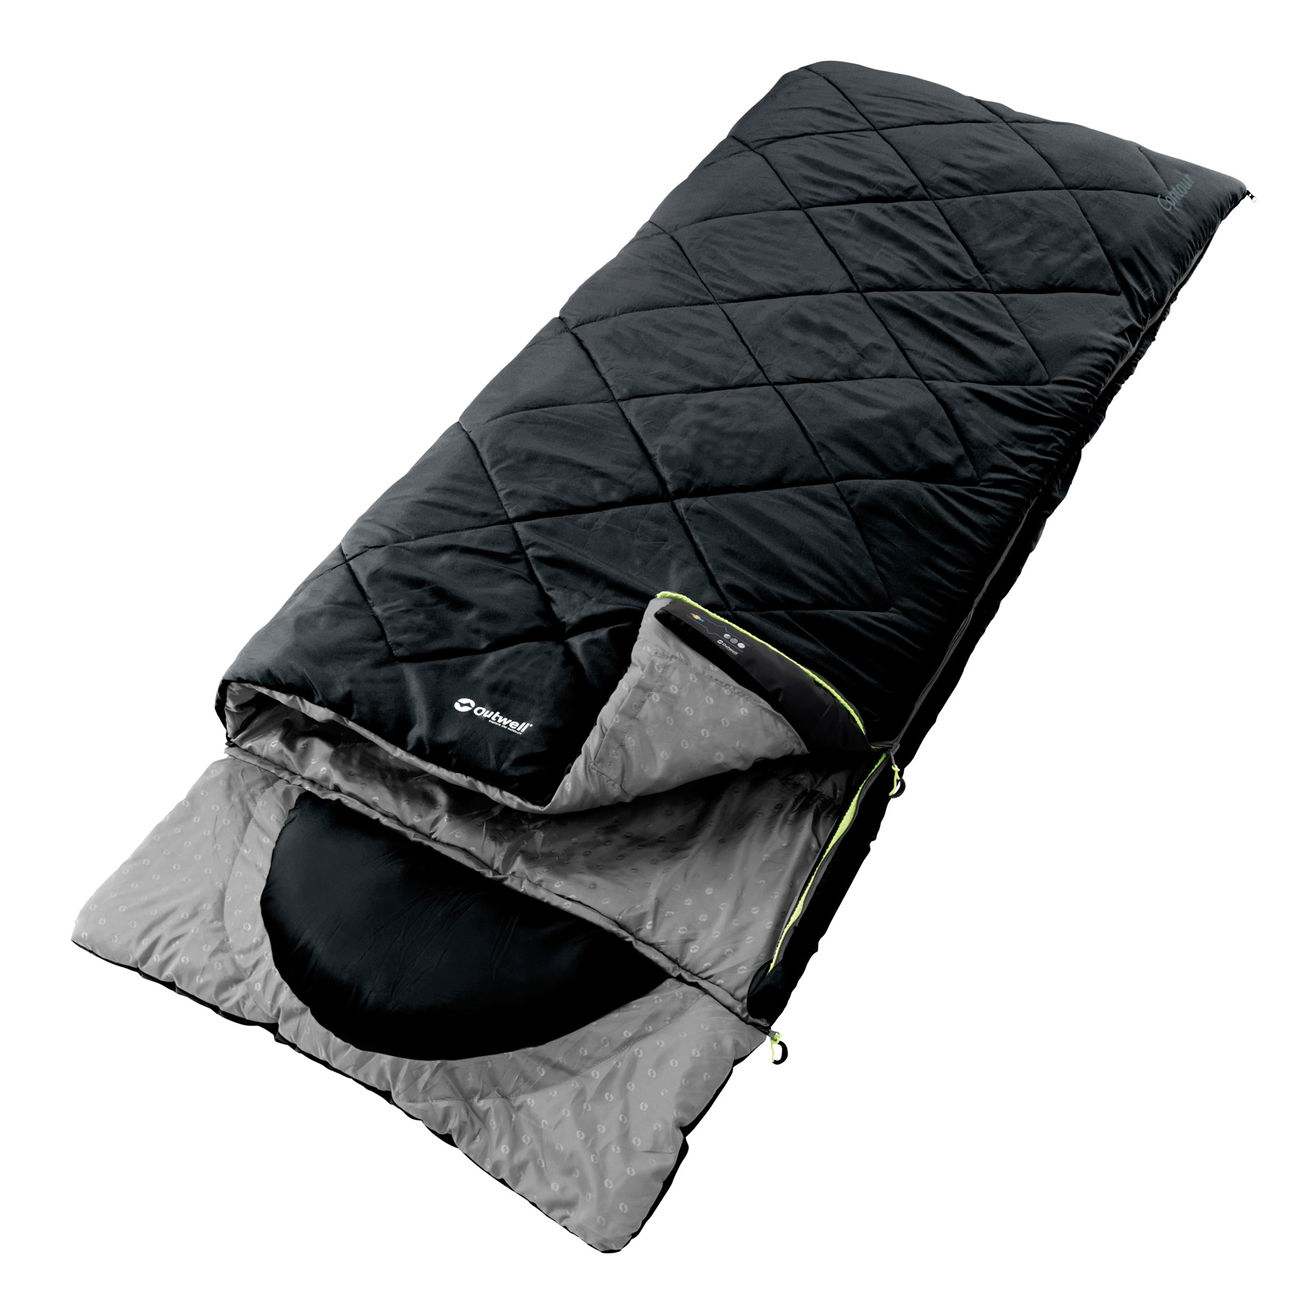 outwell contour standard schlafsack mit kissen schwarz kotte zeller. Black Bedroom Furniture Sets. Home Design Ideas